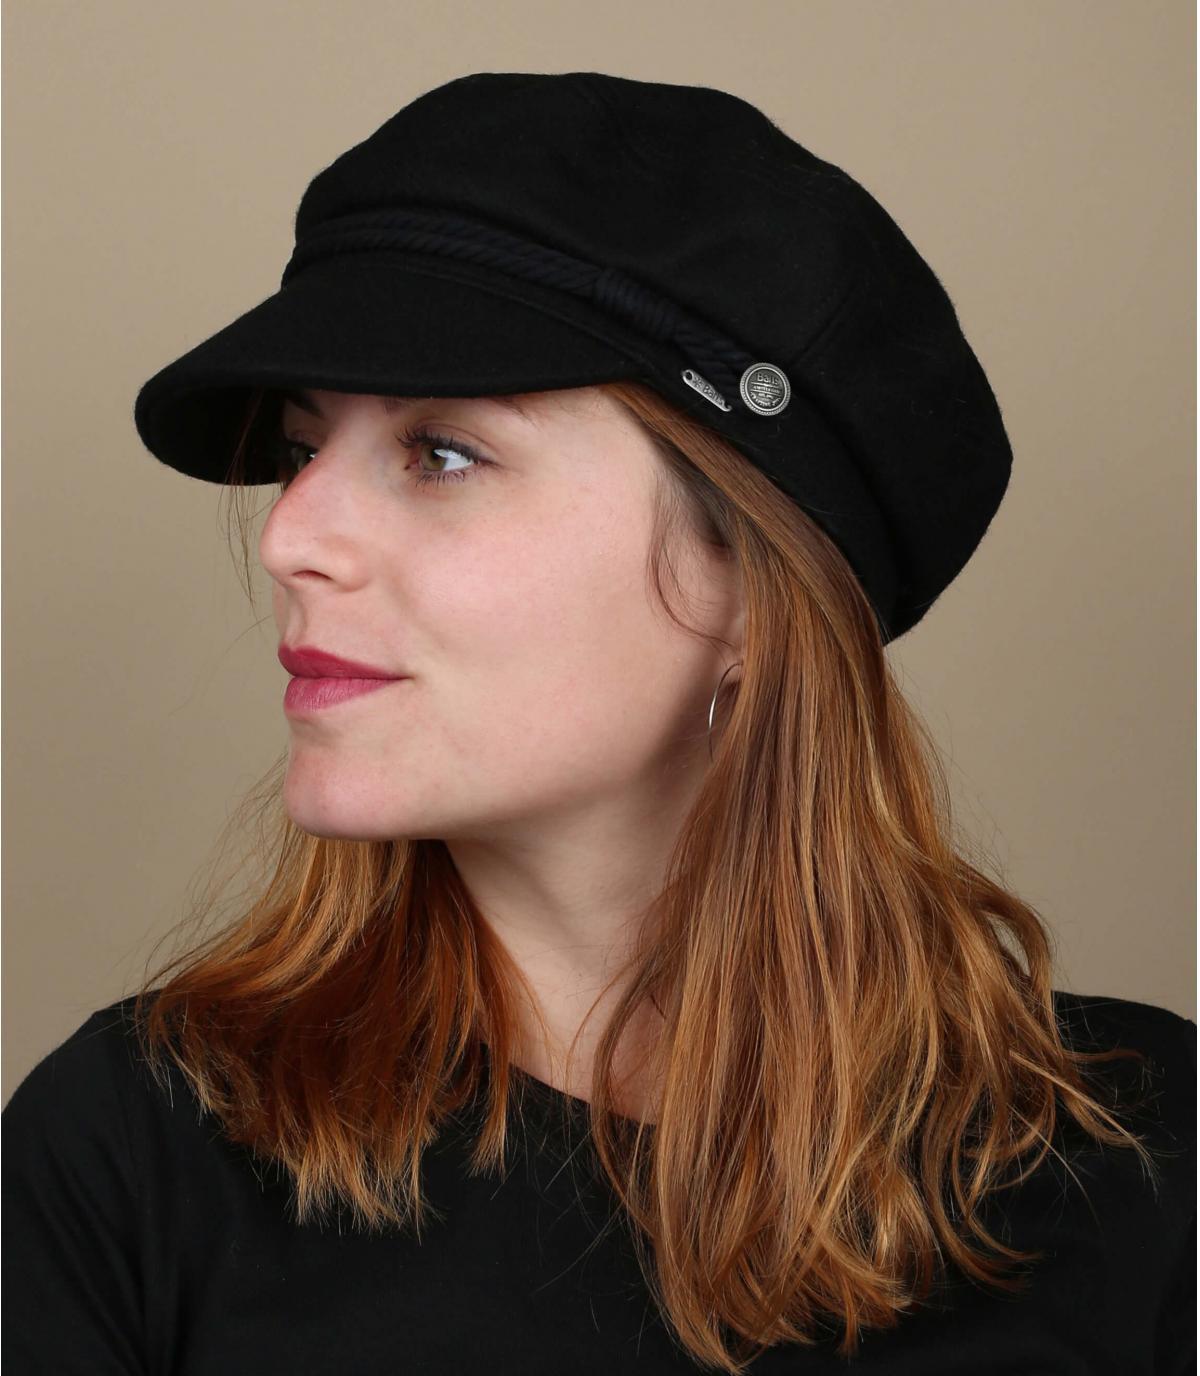 black seaman cap